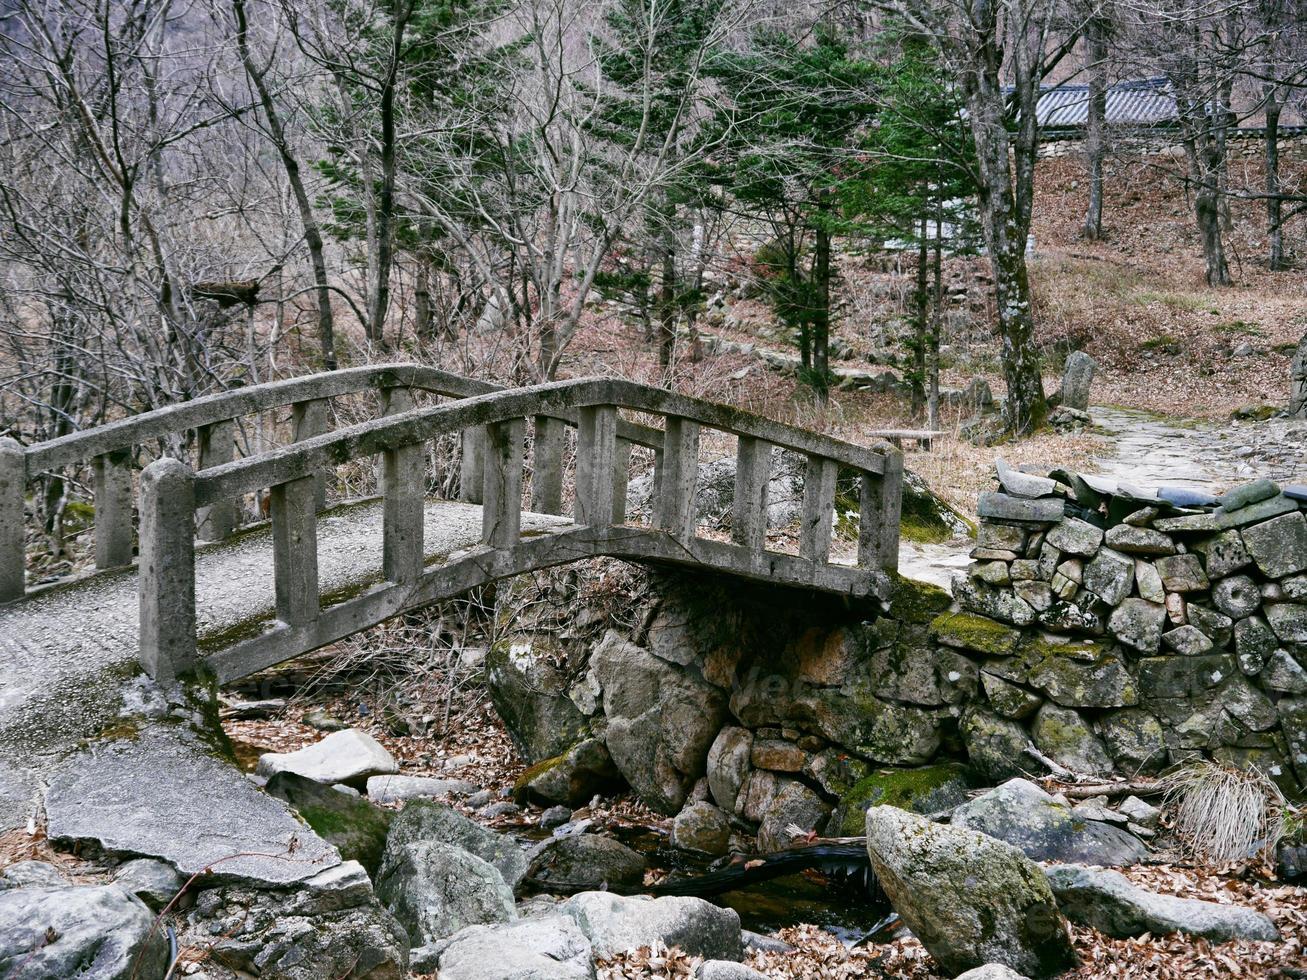 Old bridge under a creek in the forest of Seoraksan National Park. South Korea photo